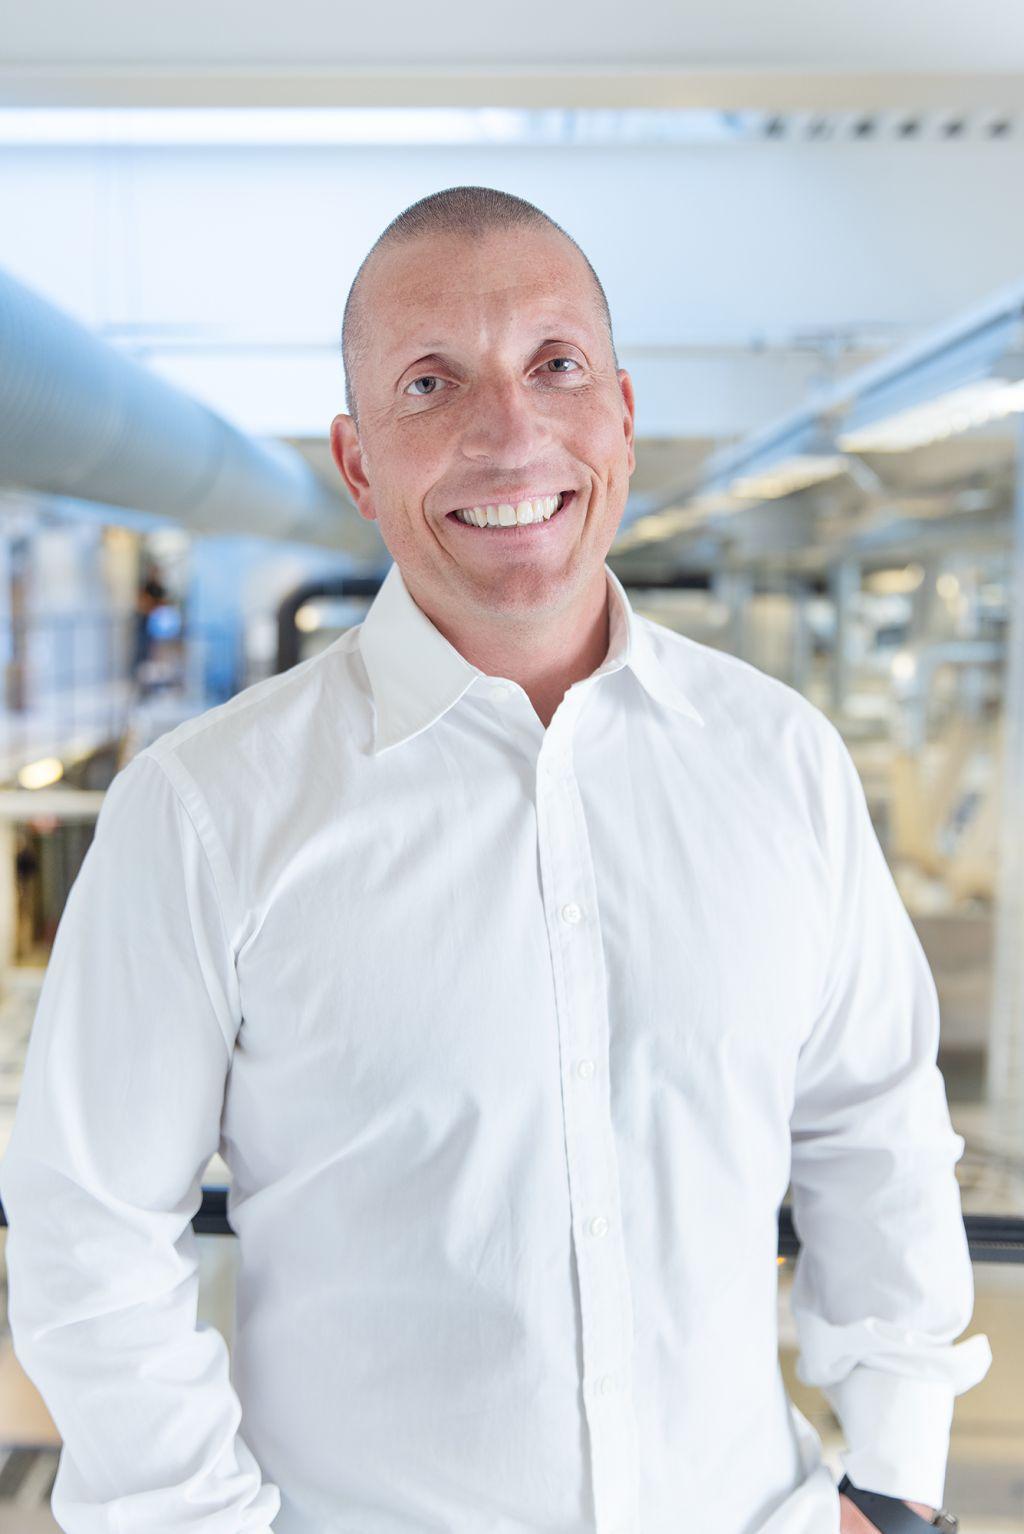 Giovanni Fili, Founder, CEO & Board Member, Exeger